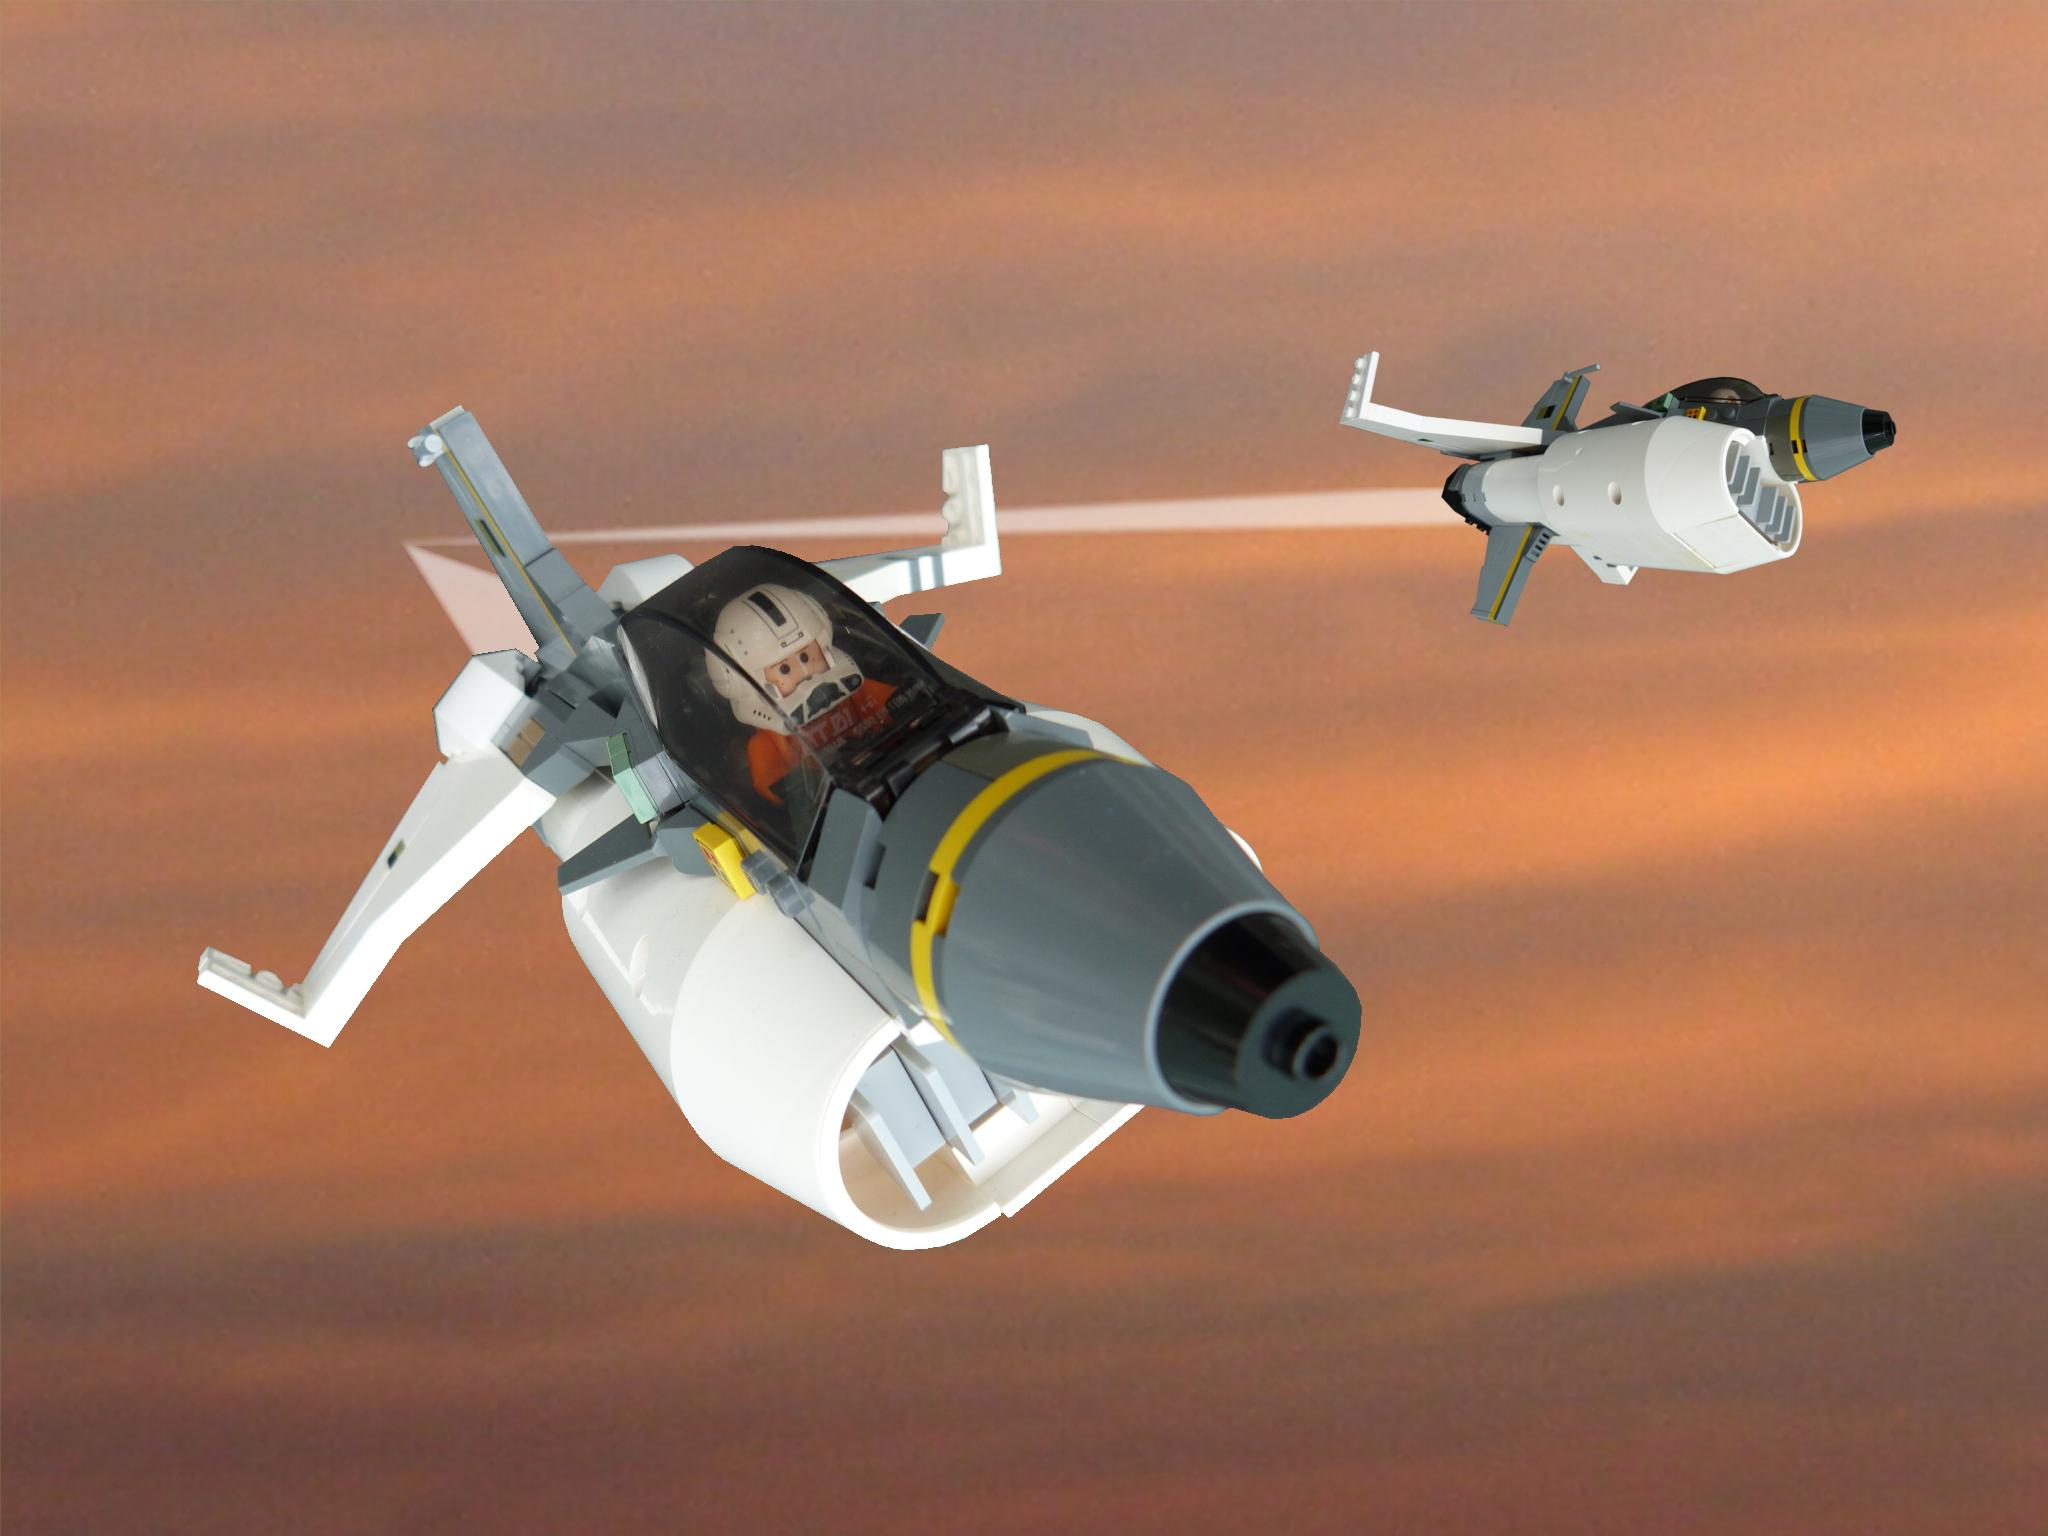 Aereo Da Combattimento Cinese : Sfondi spazio veicolo aereo aerei militari lockheed